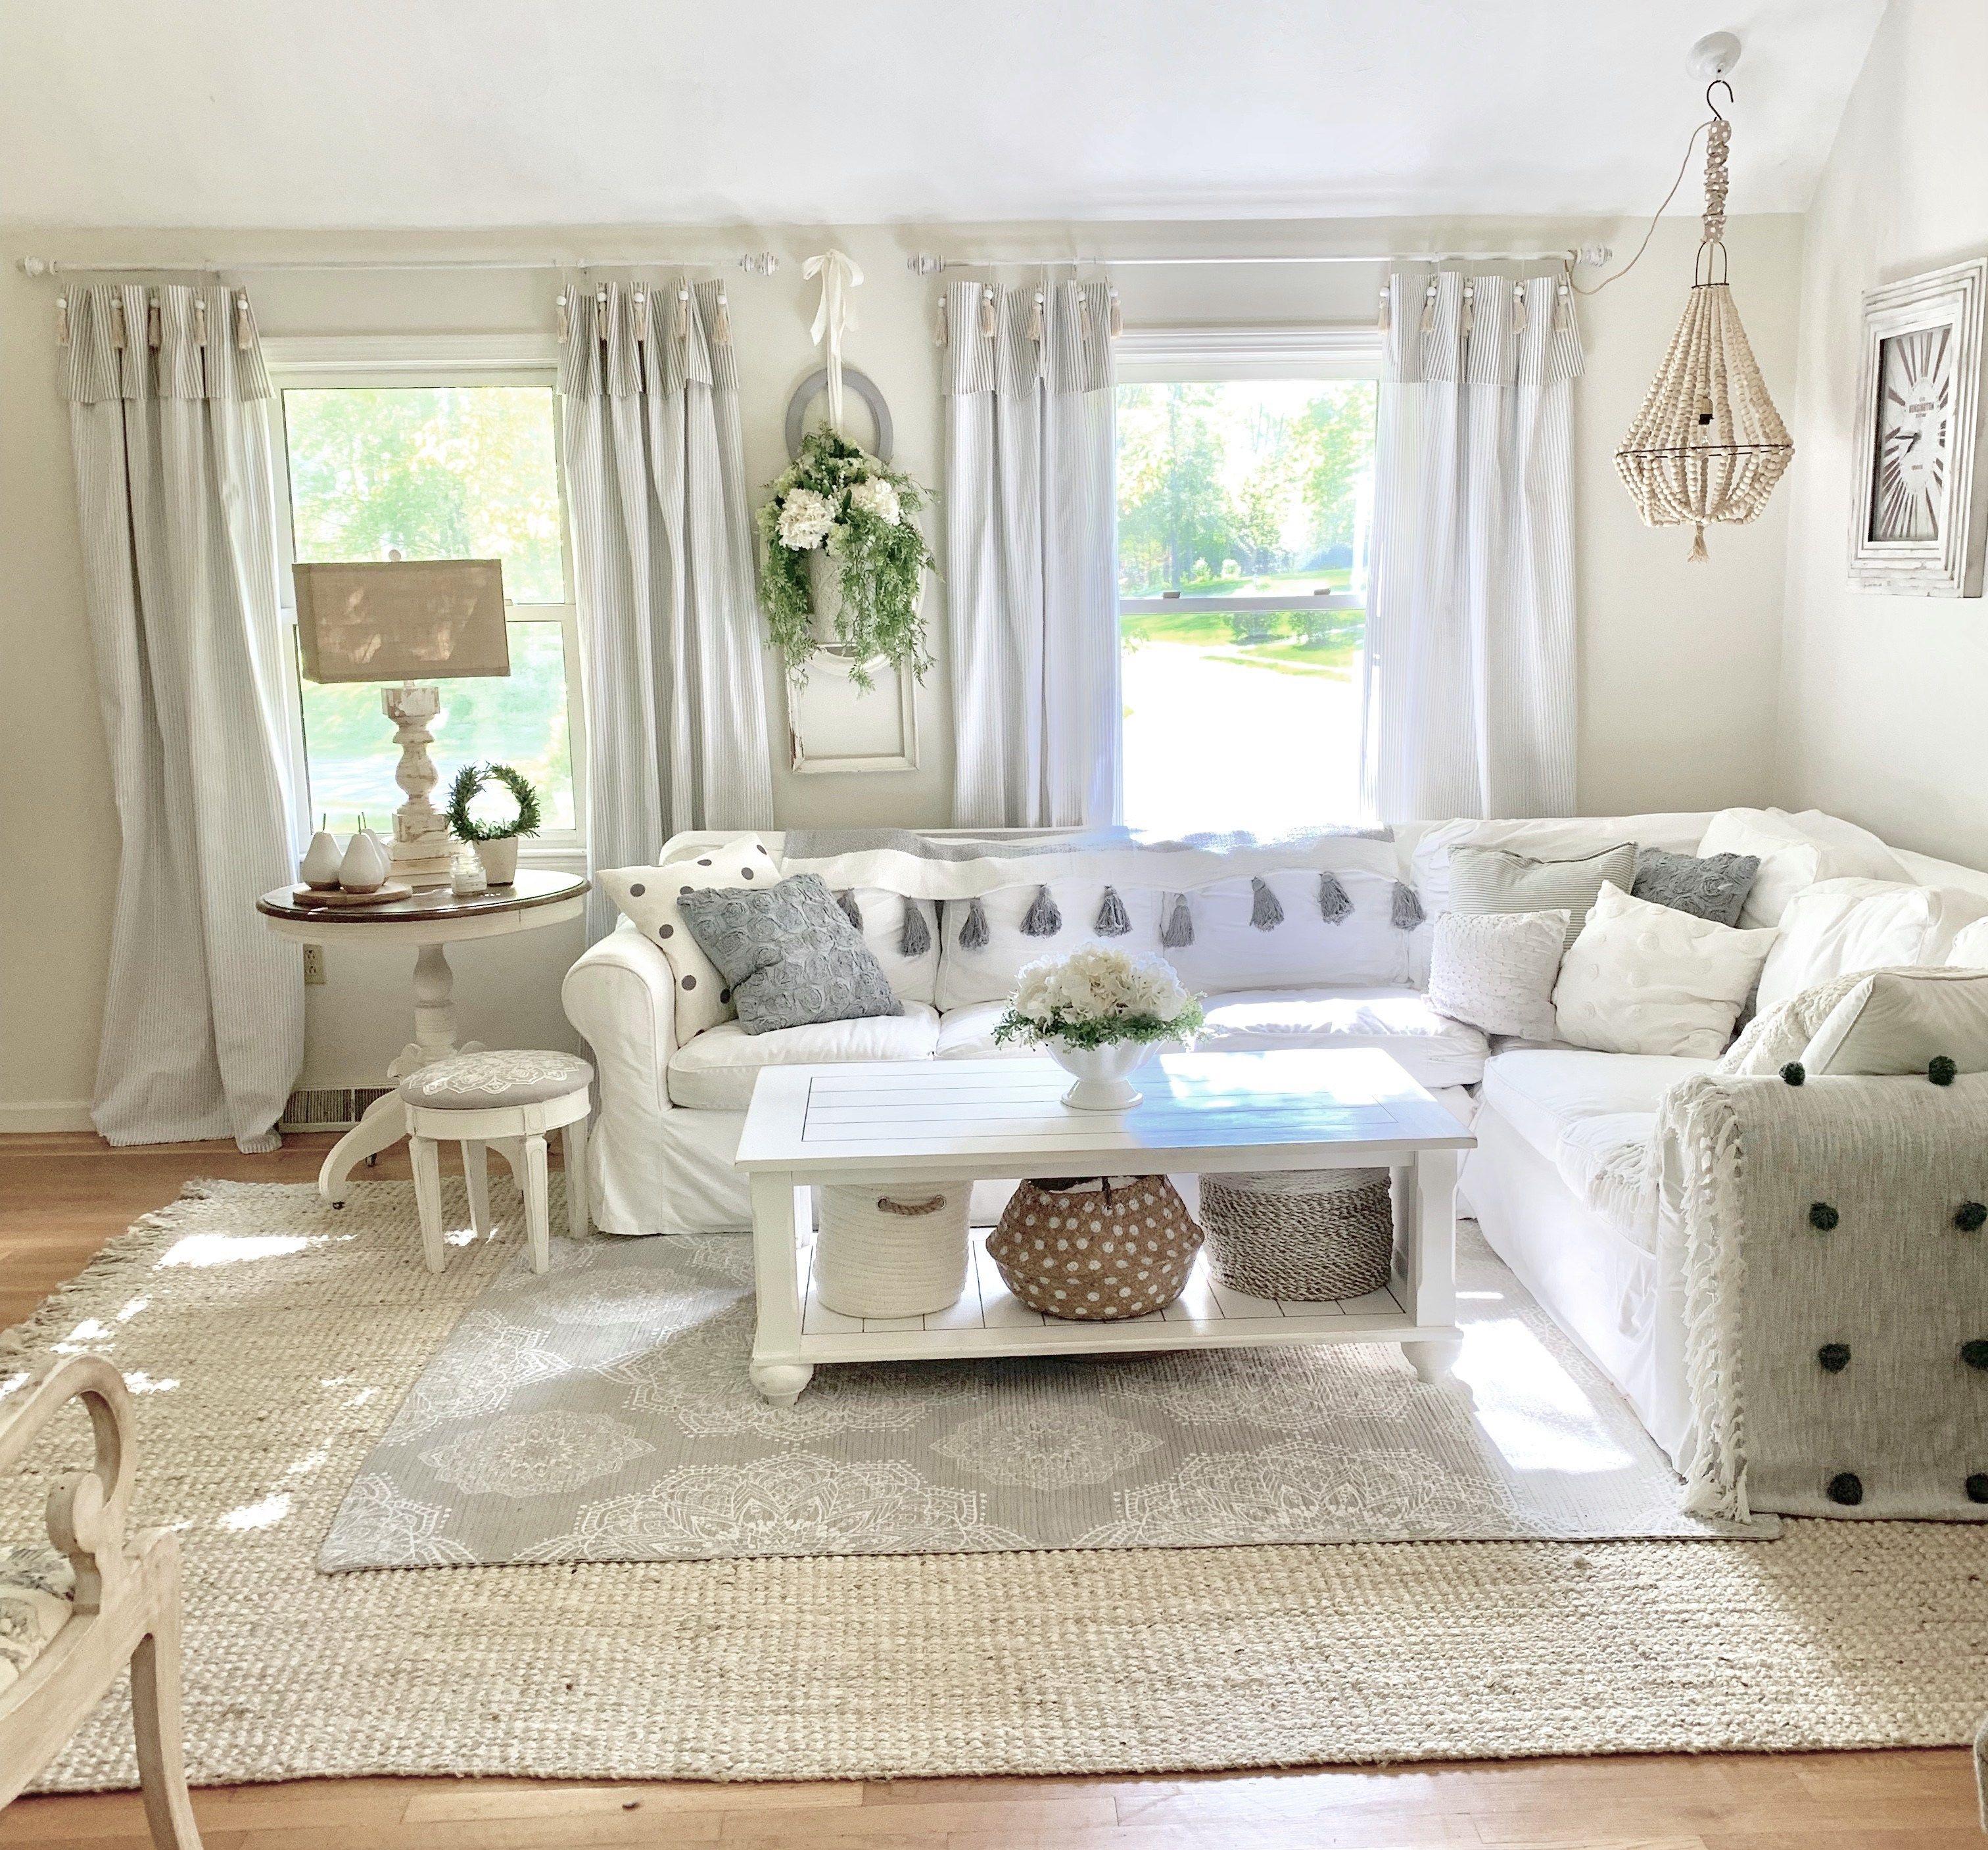 Diy Pottery Barn Inspired Tassel Ticking Stripe Curtains In 2020 Ticking Stripe Curtains Stripe Curtains Living Room Pottery Barn Curtains #pottery #barn #inspired #living #room